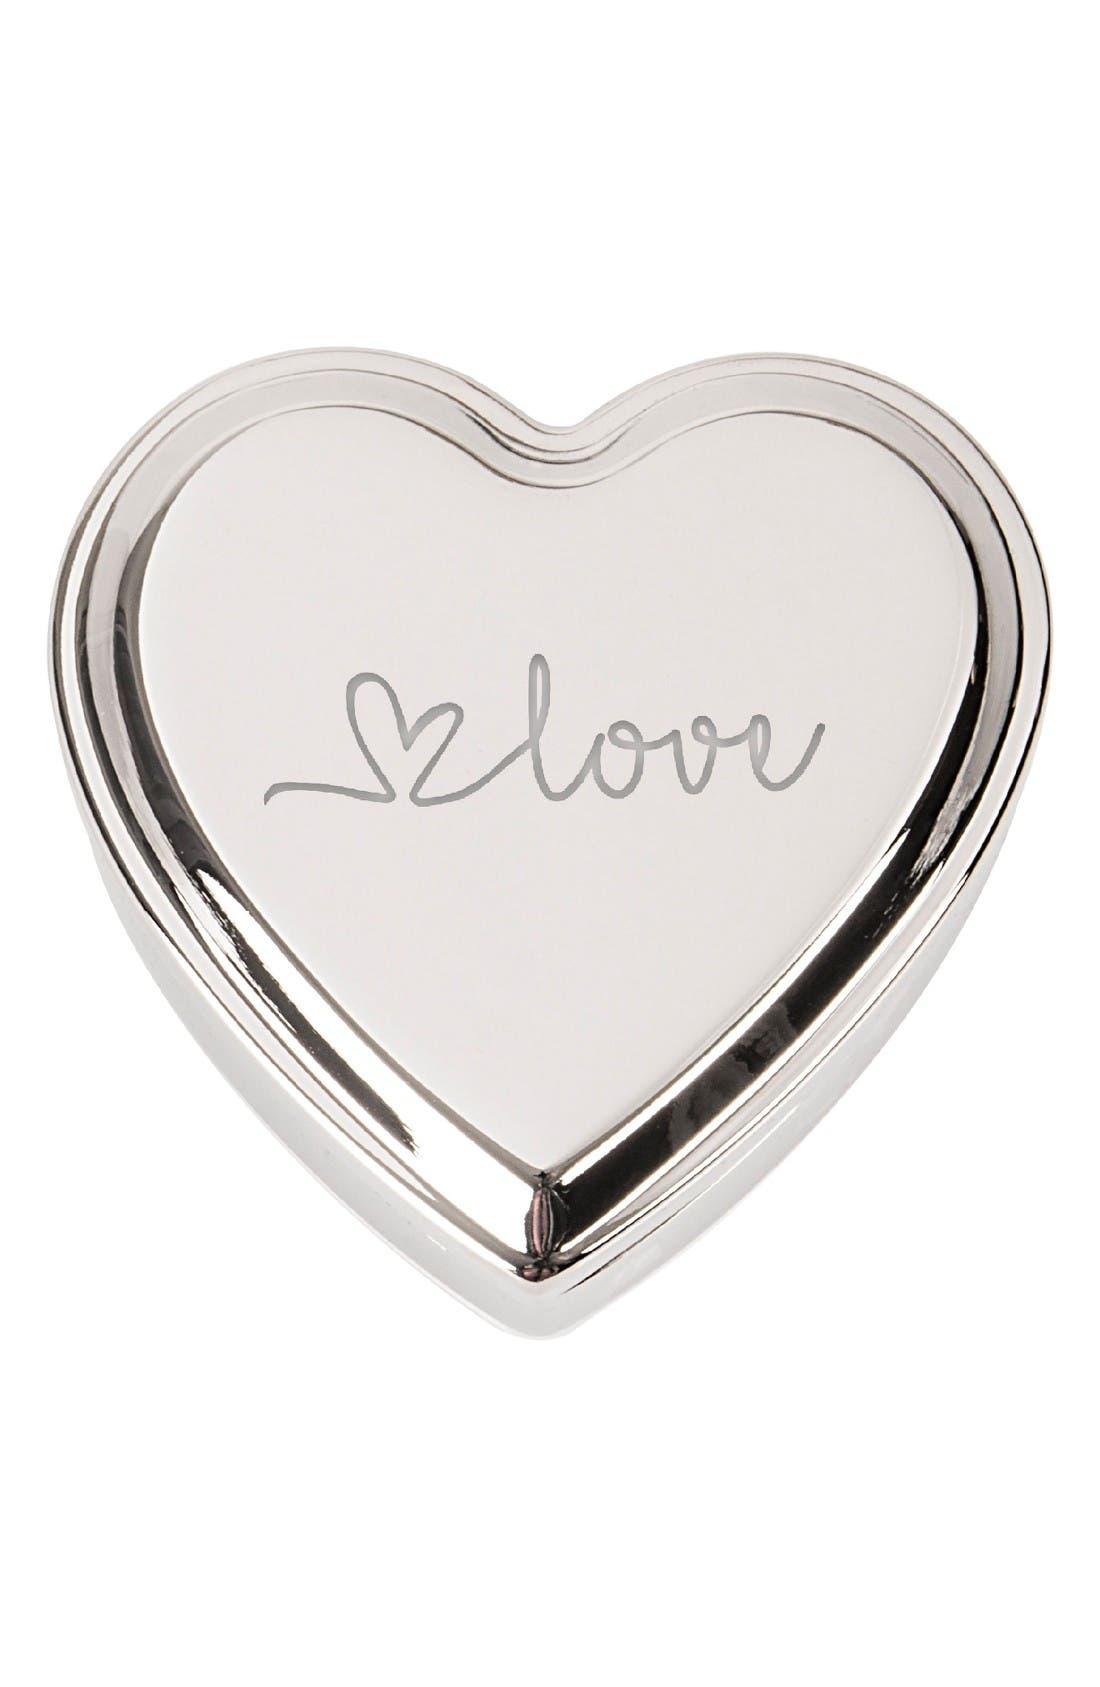 Cathy's Concepts Love Heart Keepsake Box